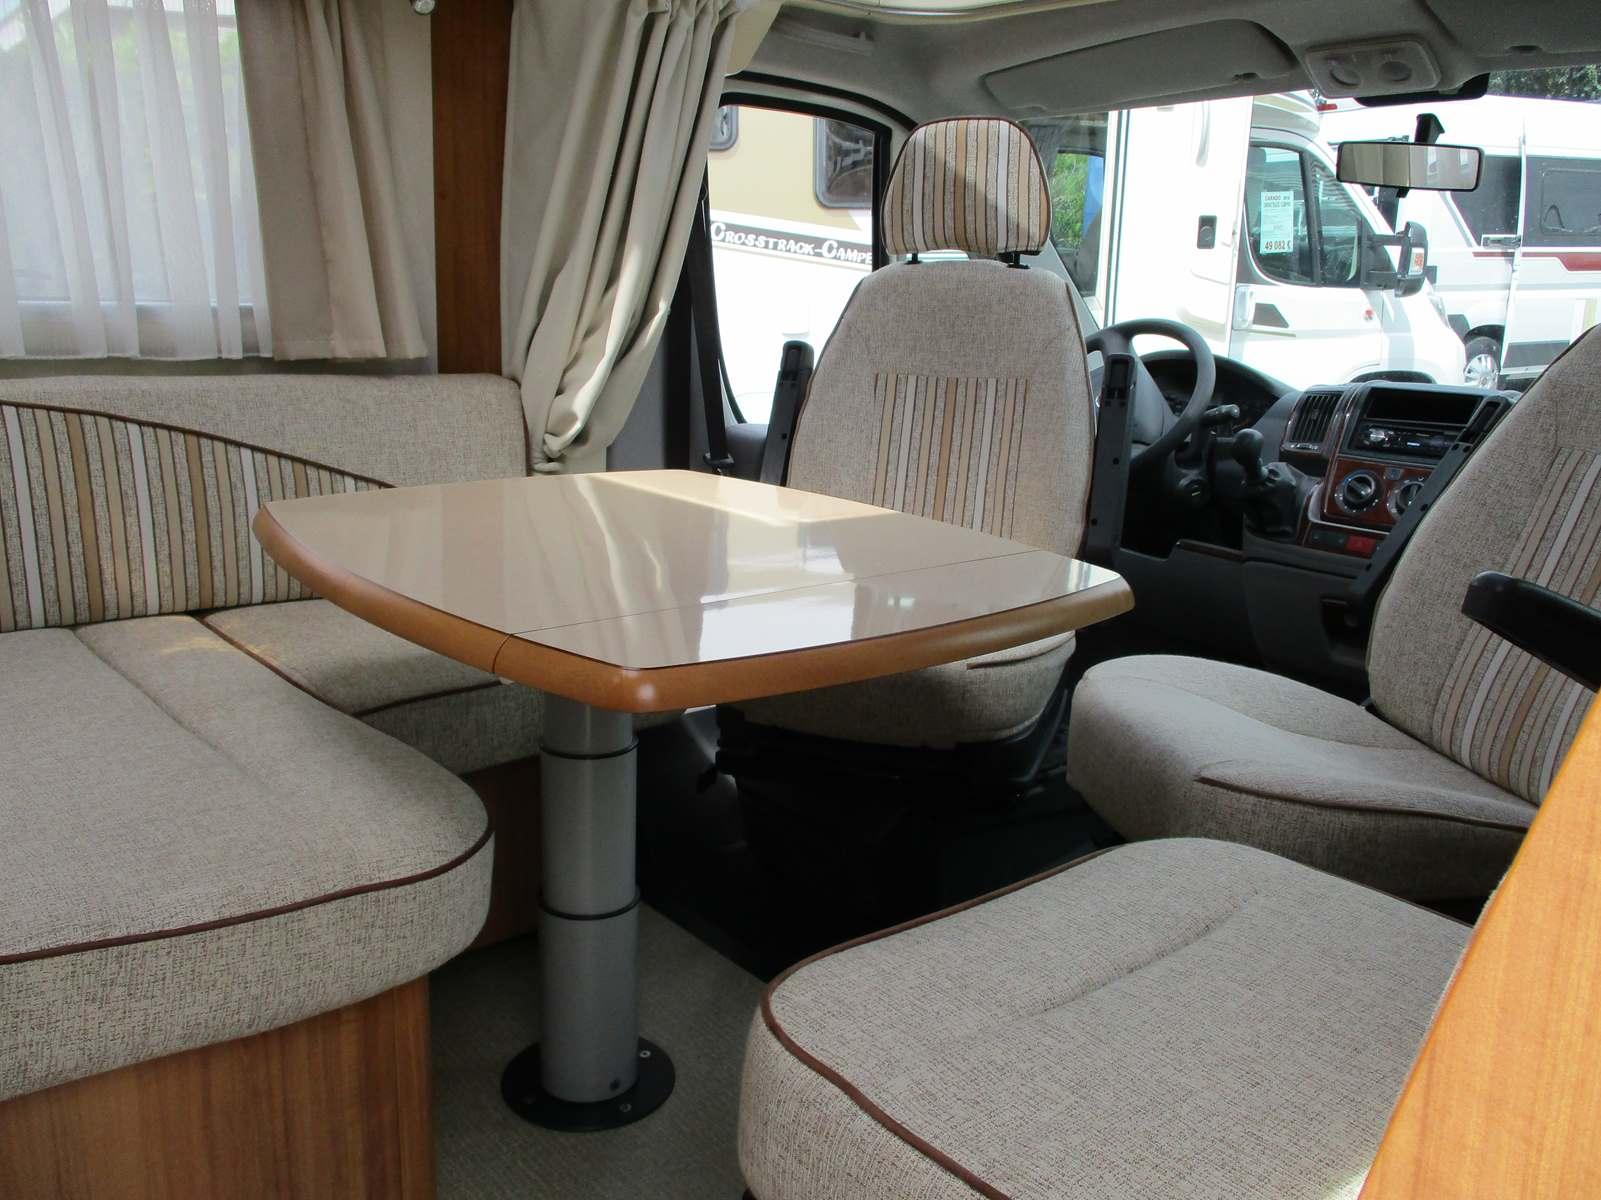 Eura Mobil 710 Qb - 7